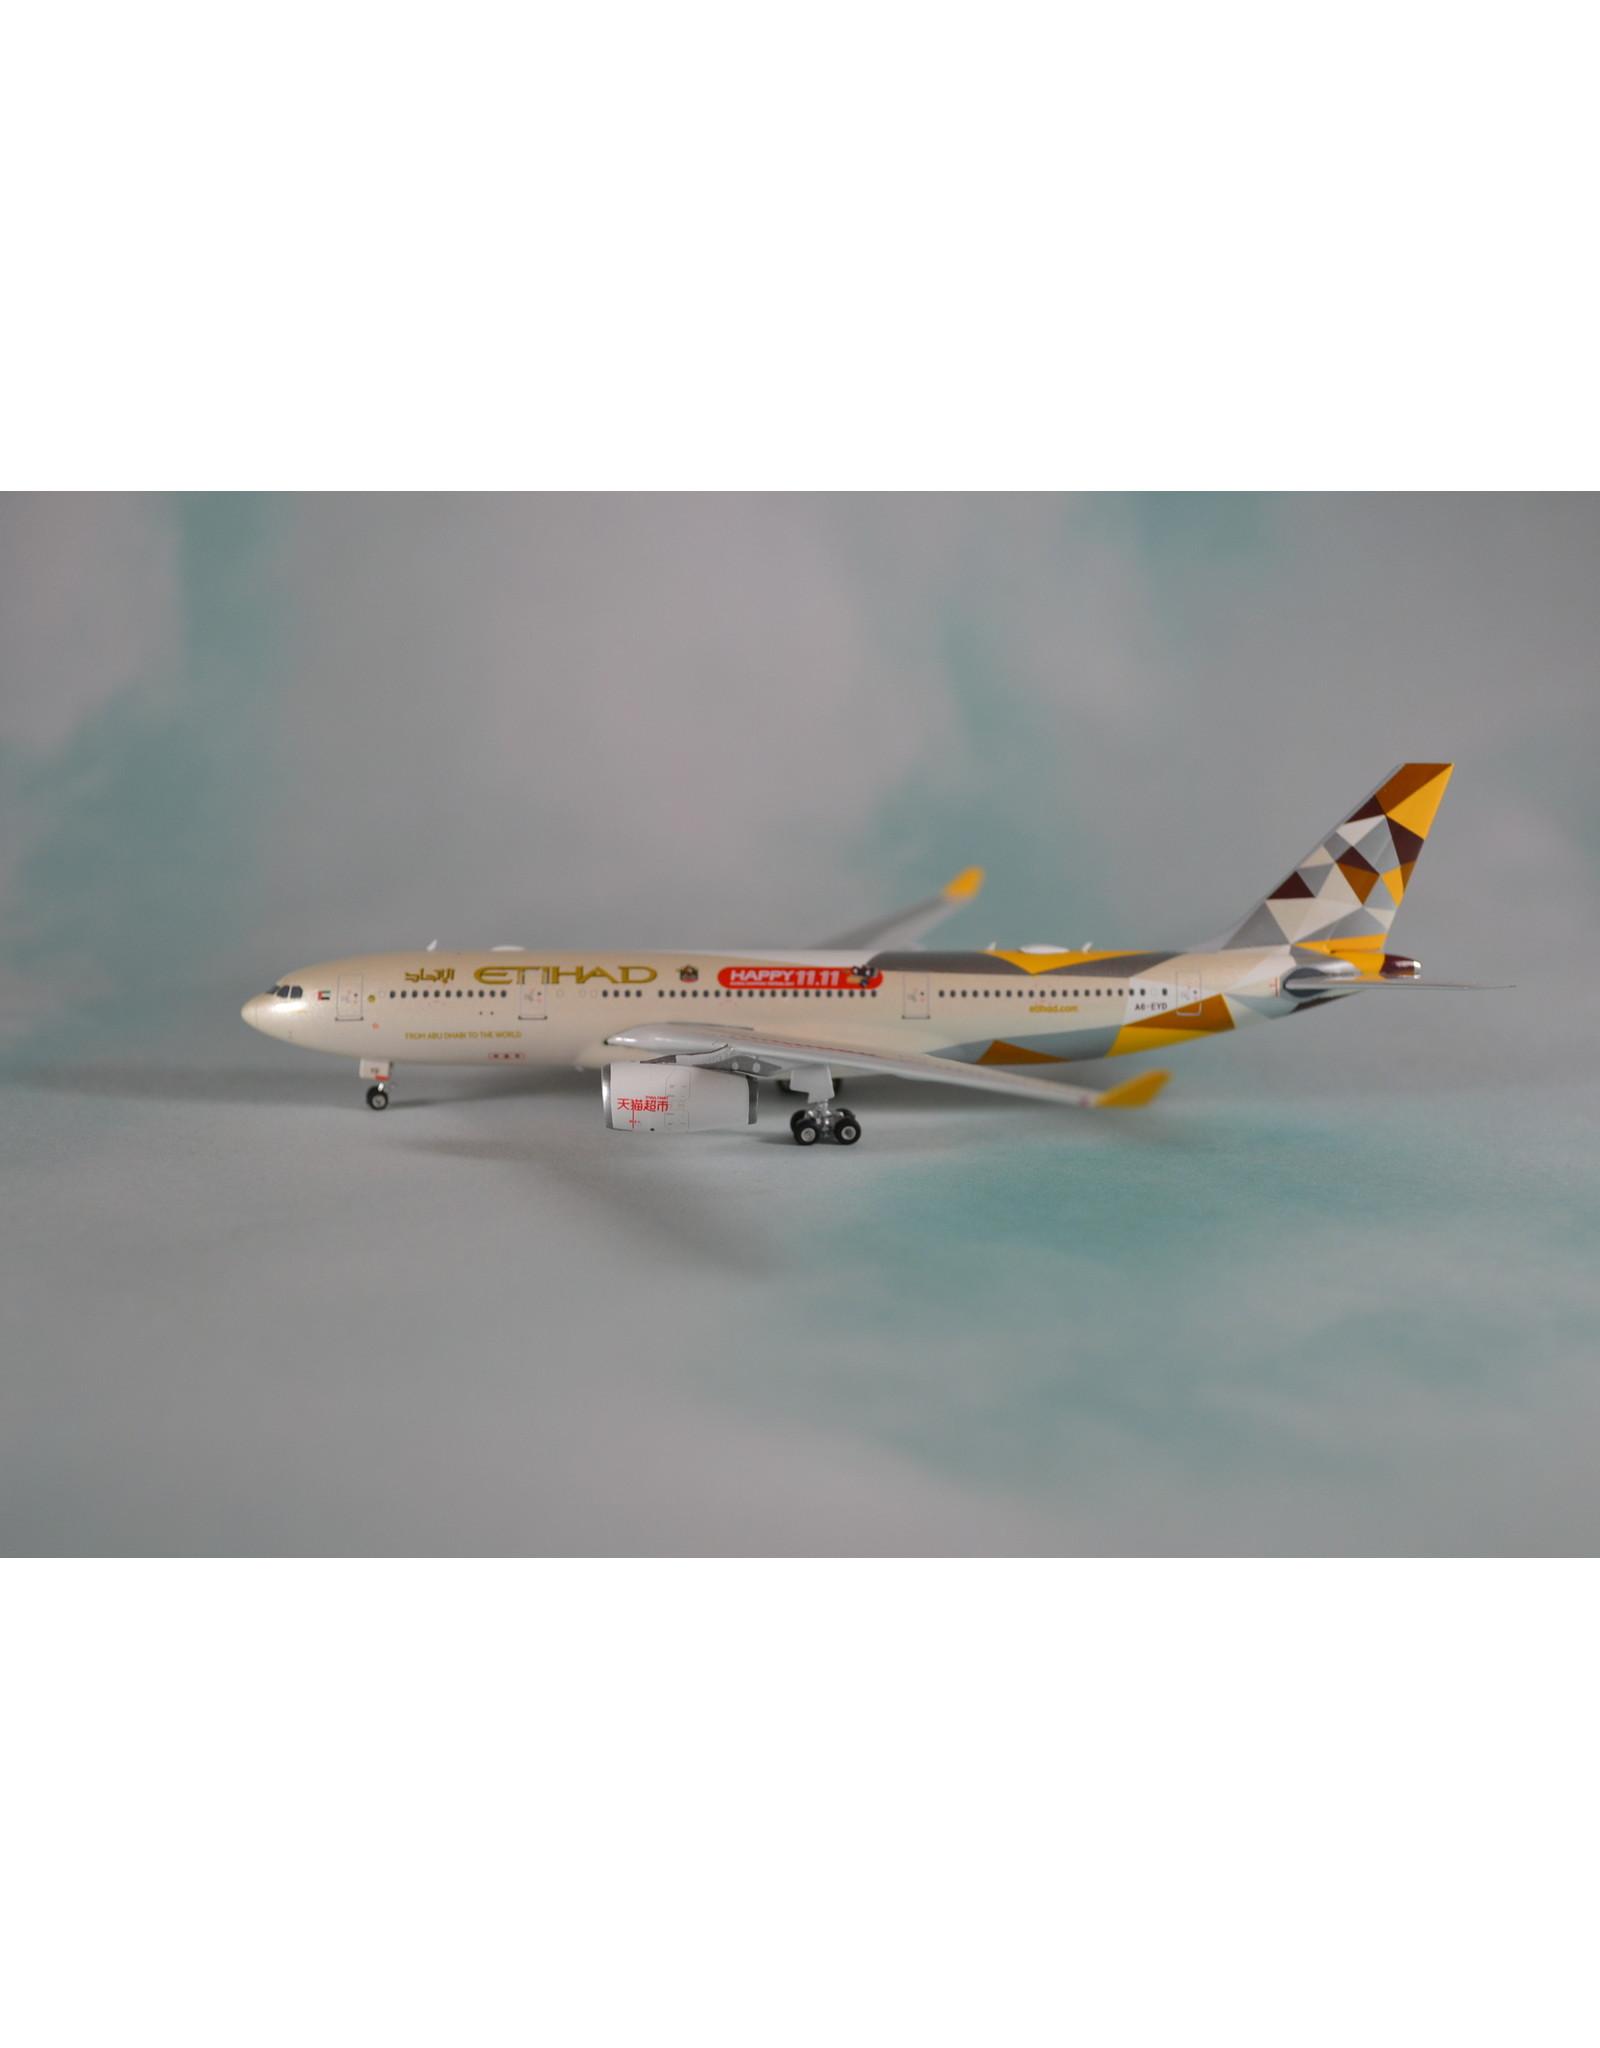 PH4 Etihad A330-200 Happy 11.11, A6-EYD